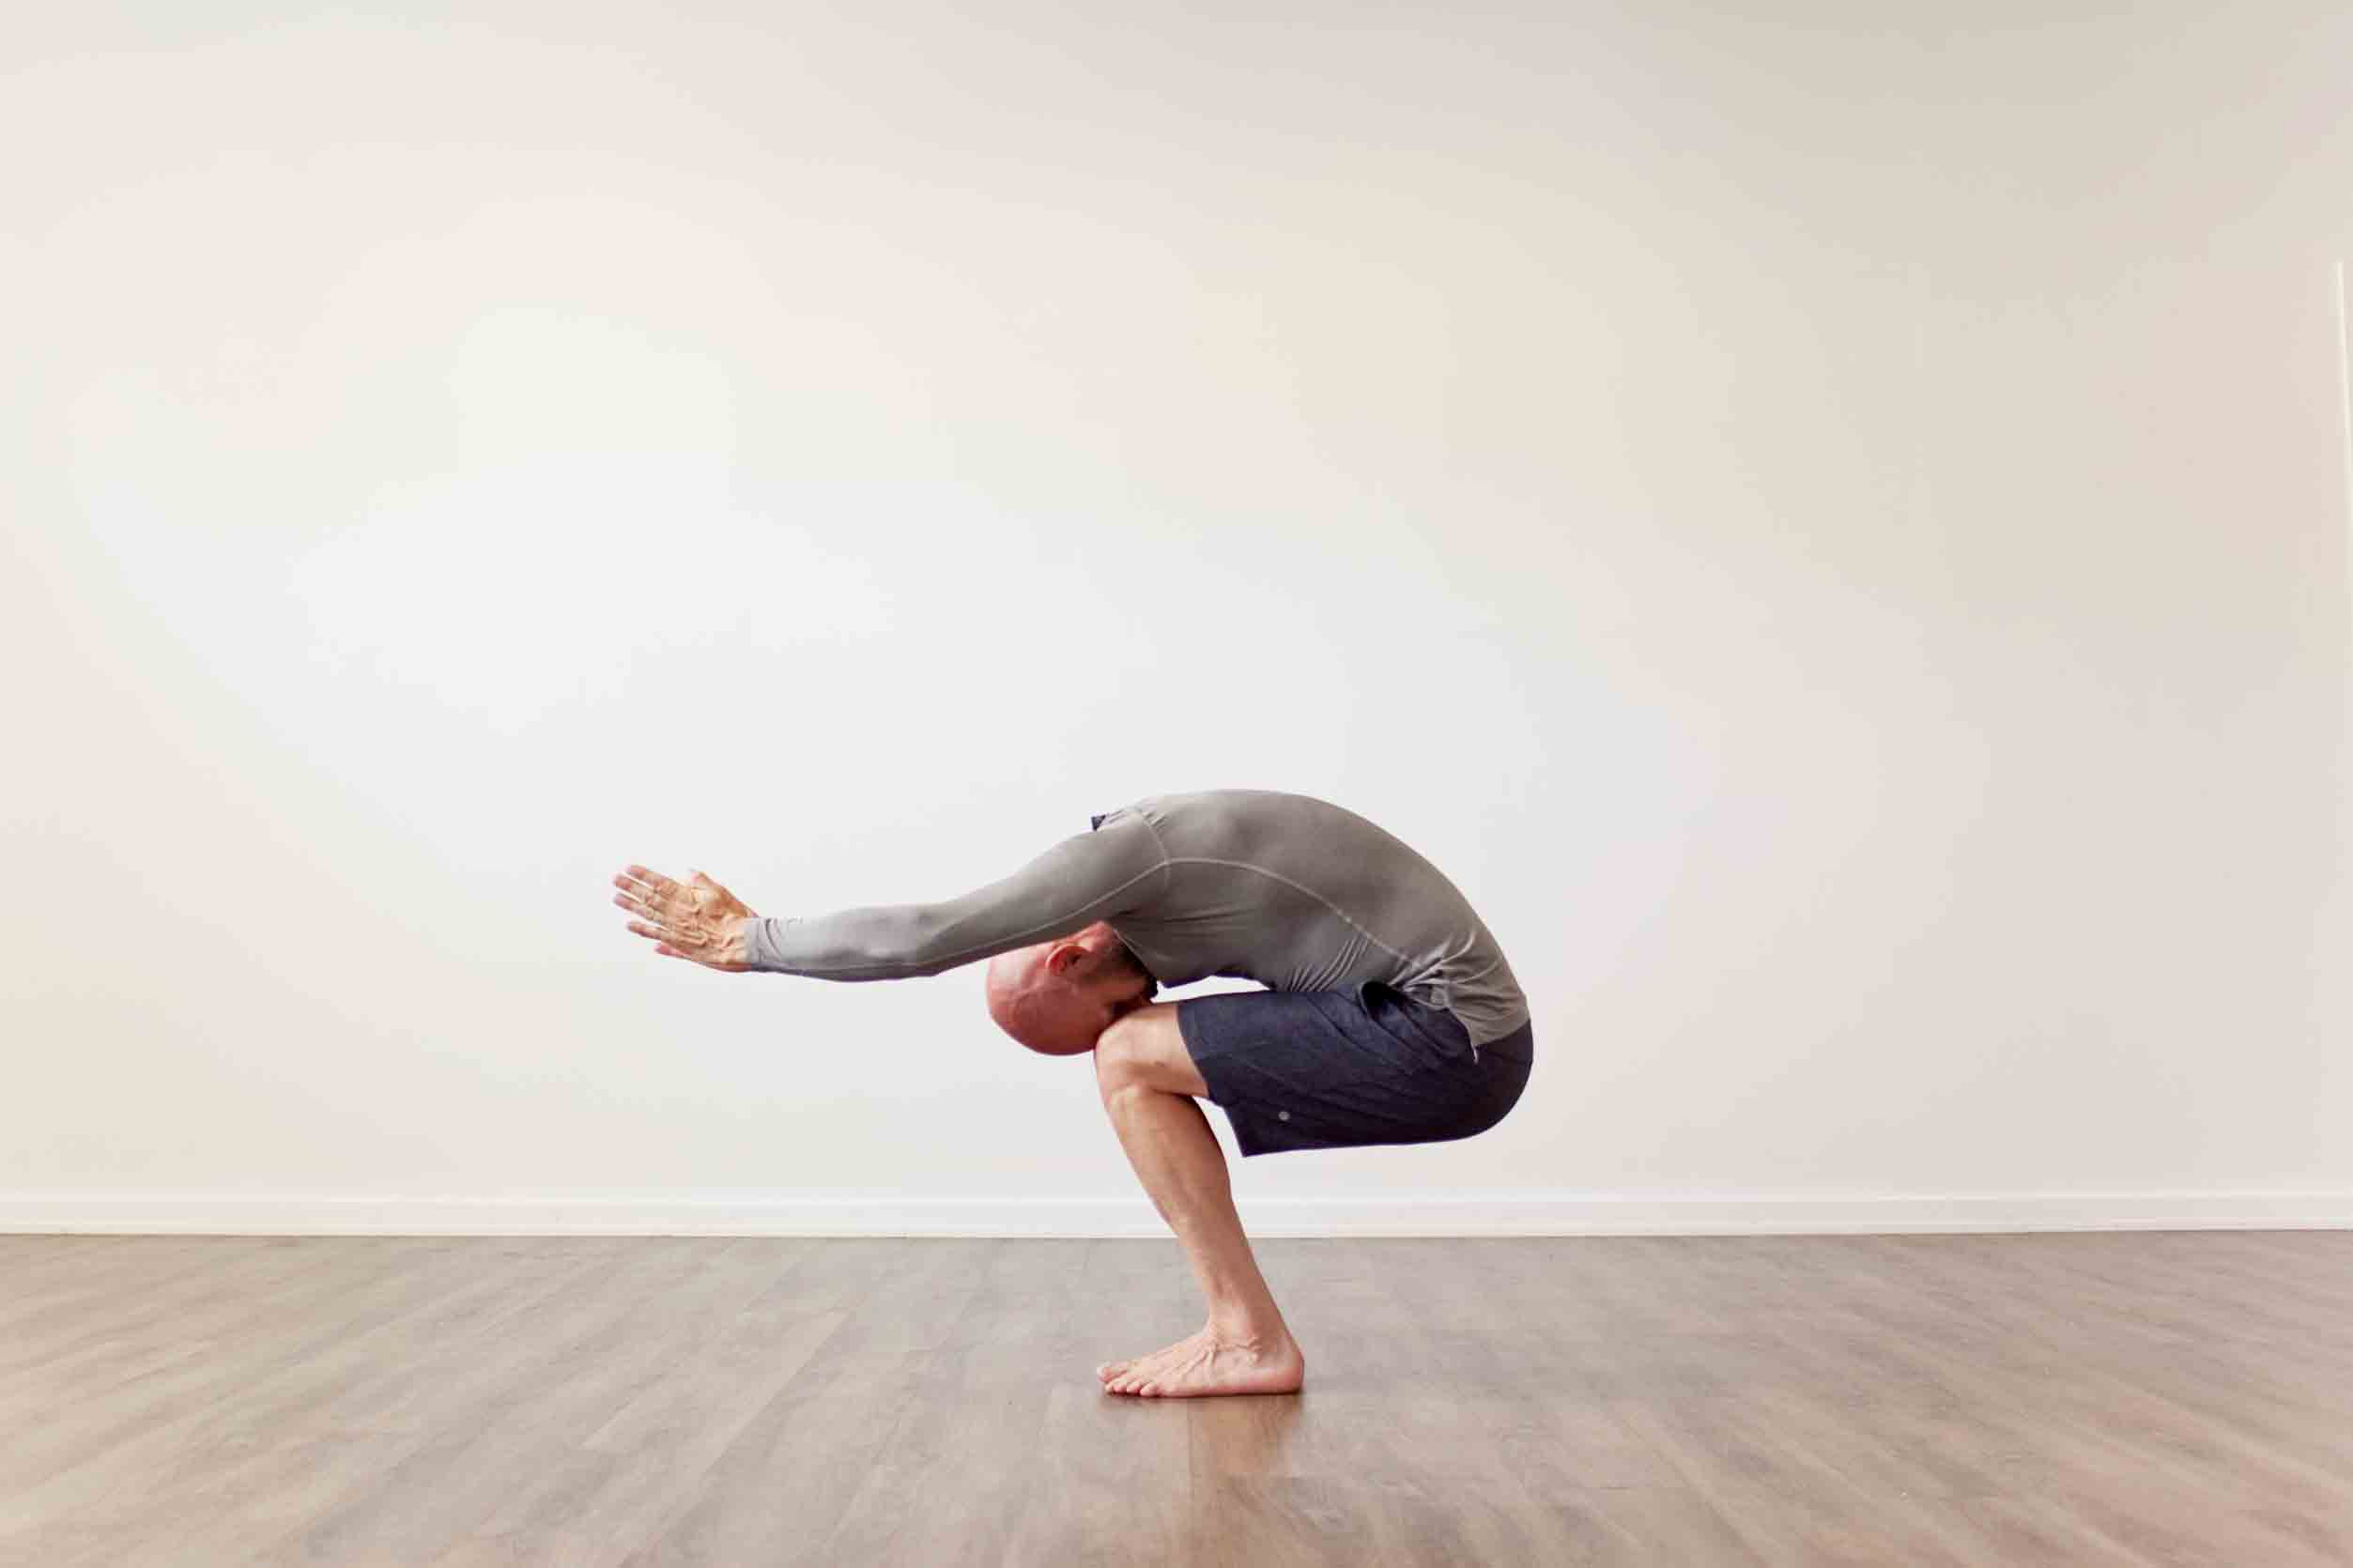 The 8 Limbs Of Yoga - Asana Explained in Depth